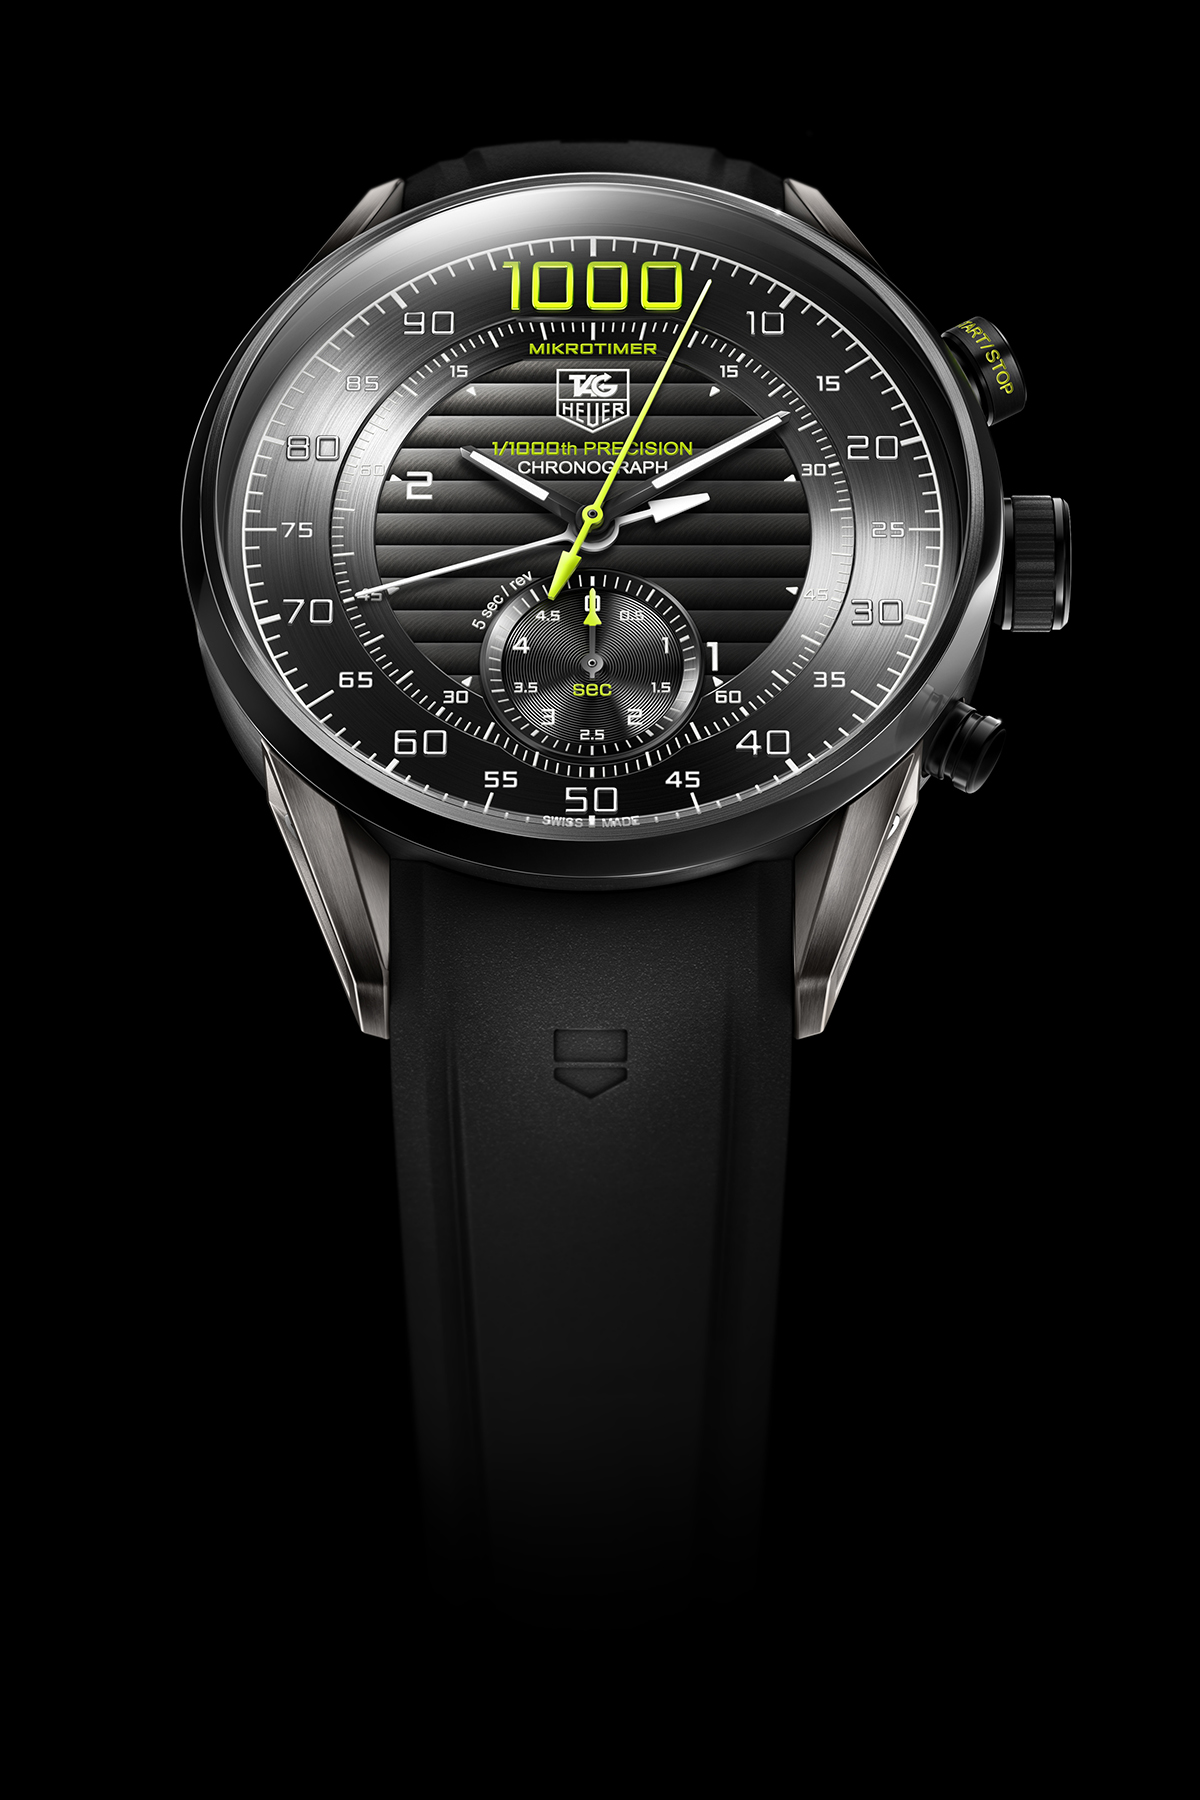 MIKROTIMER Flying 1000 Concept Chronograph